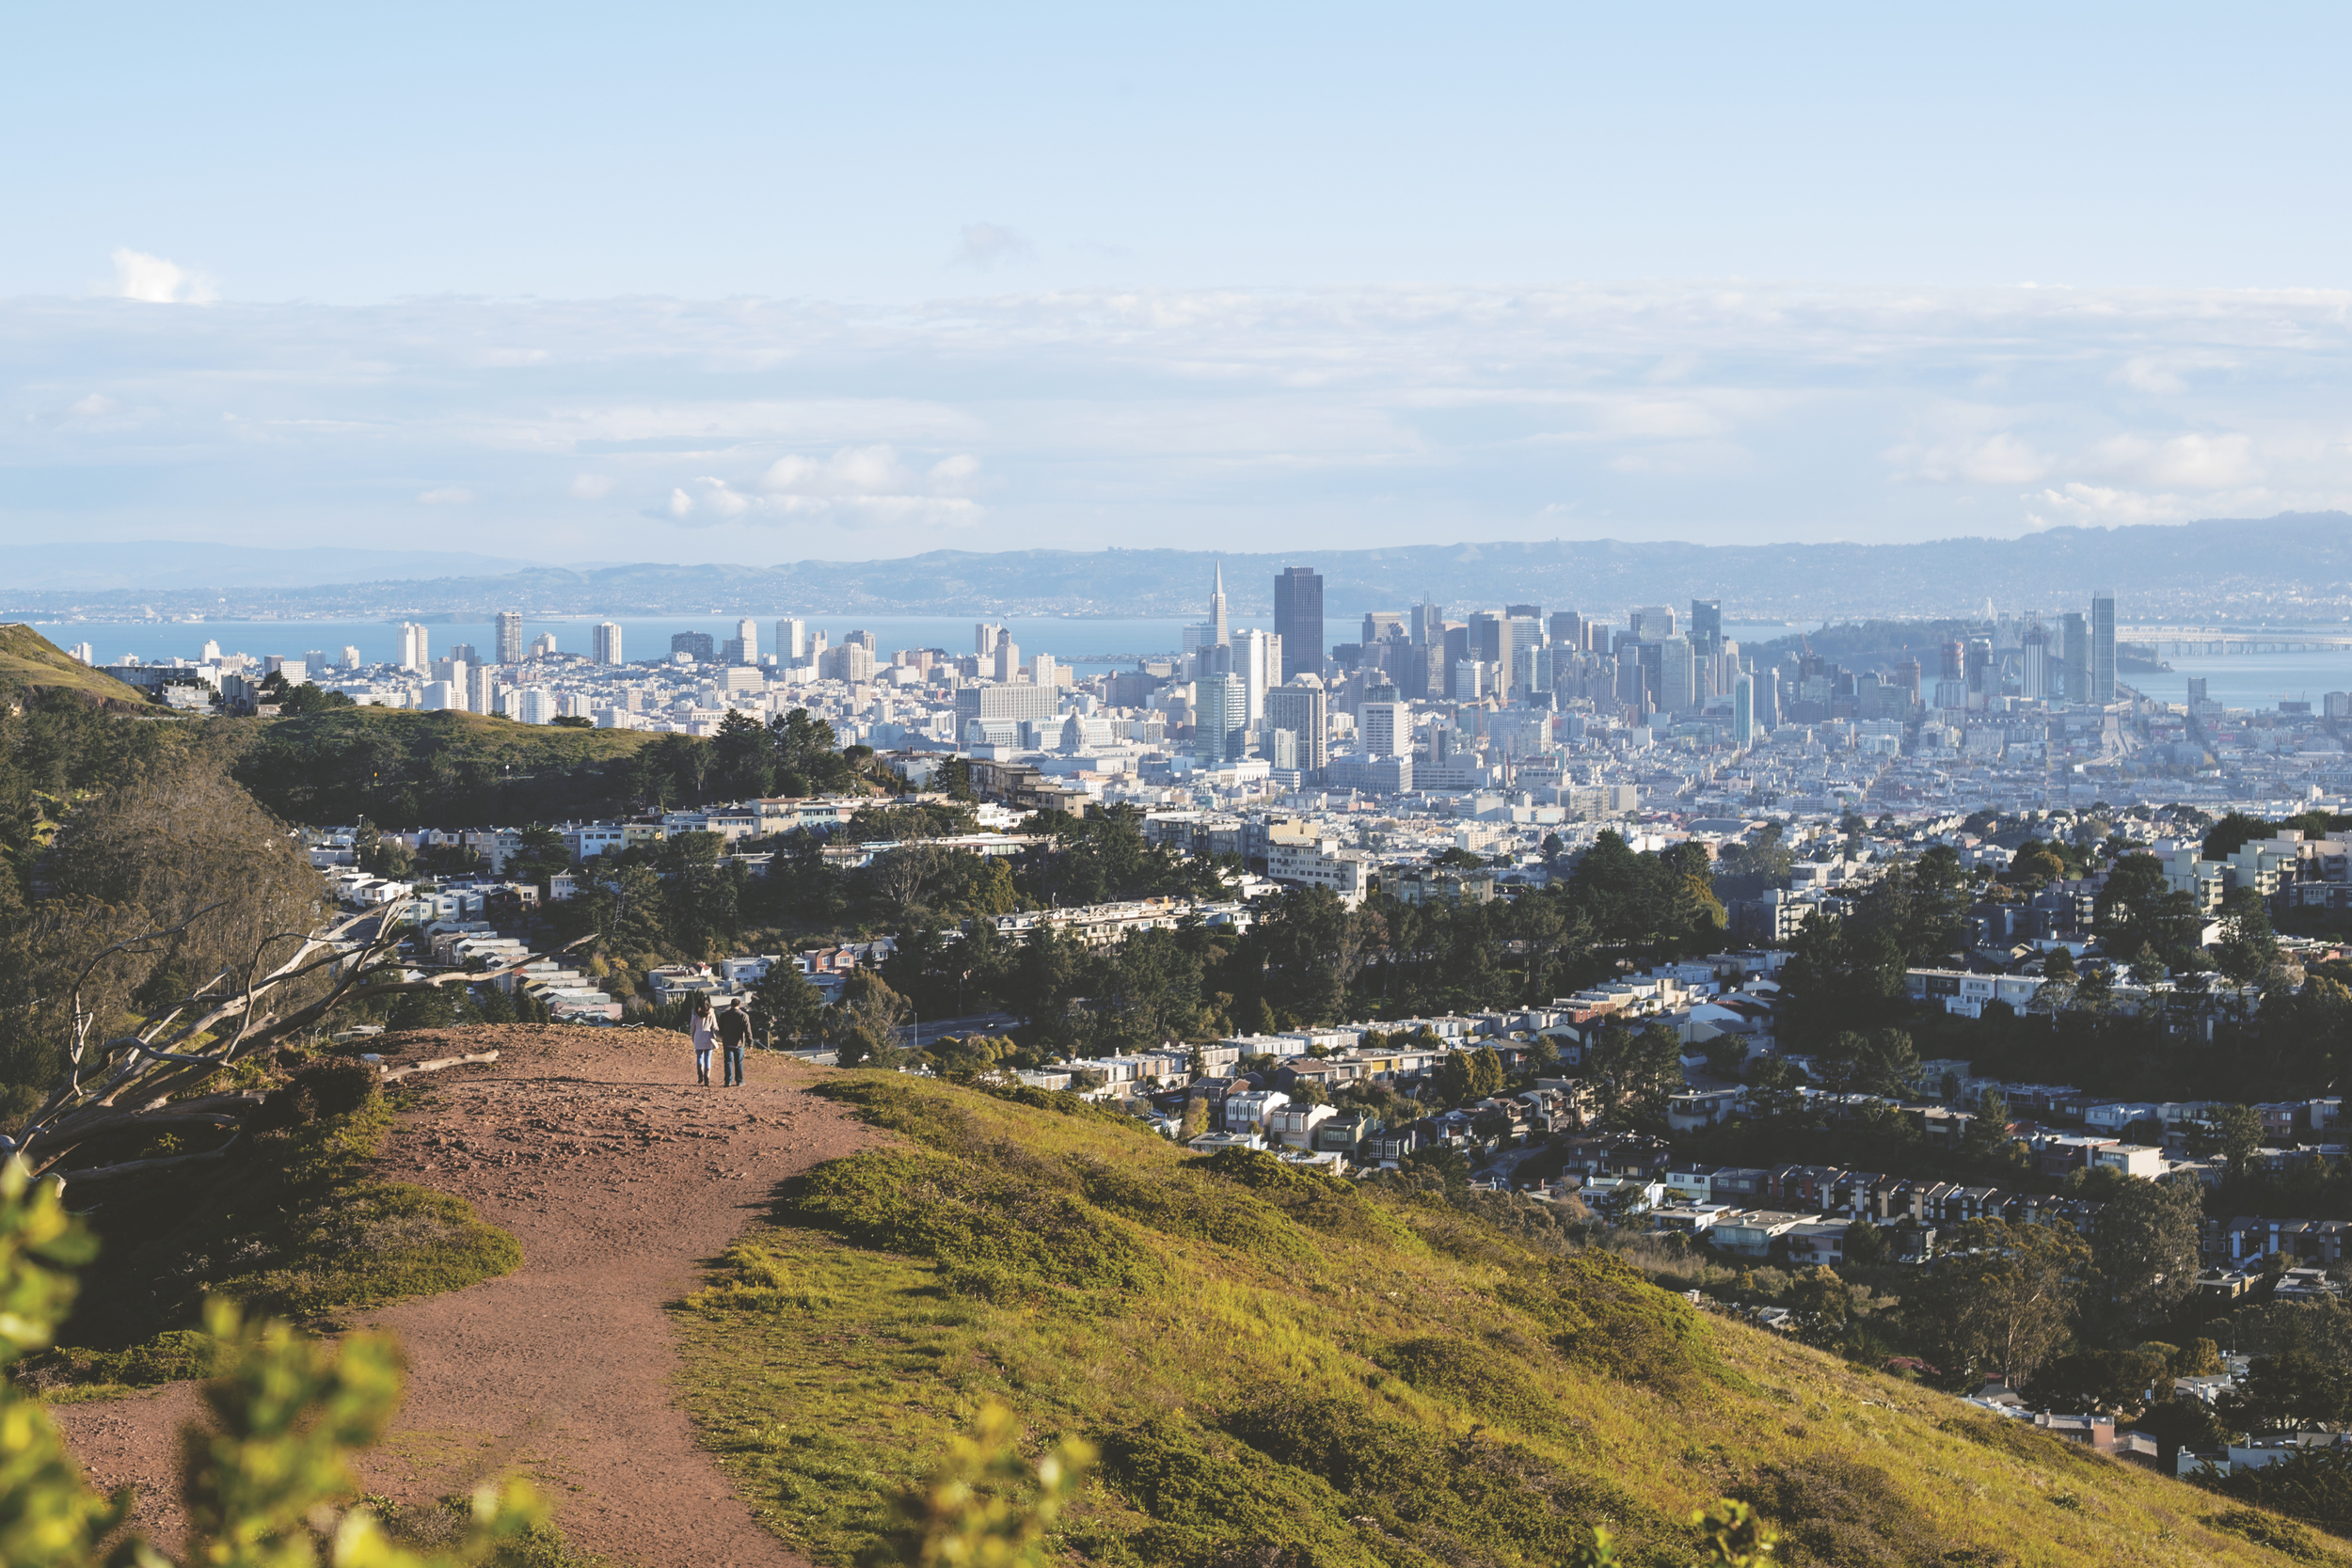 mount-davidson-skyline-cropped.jpg